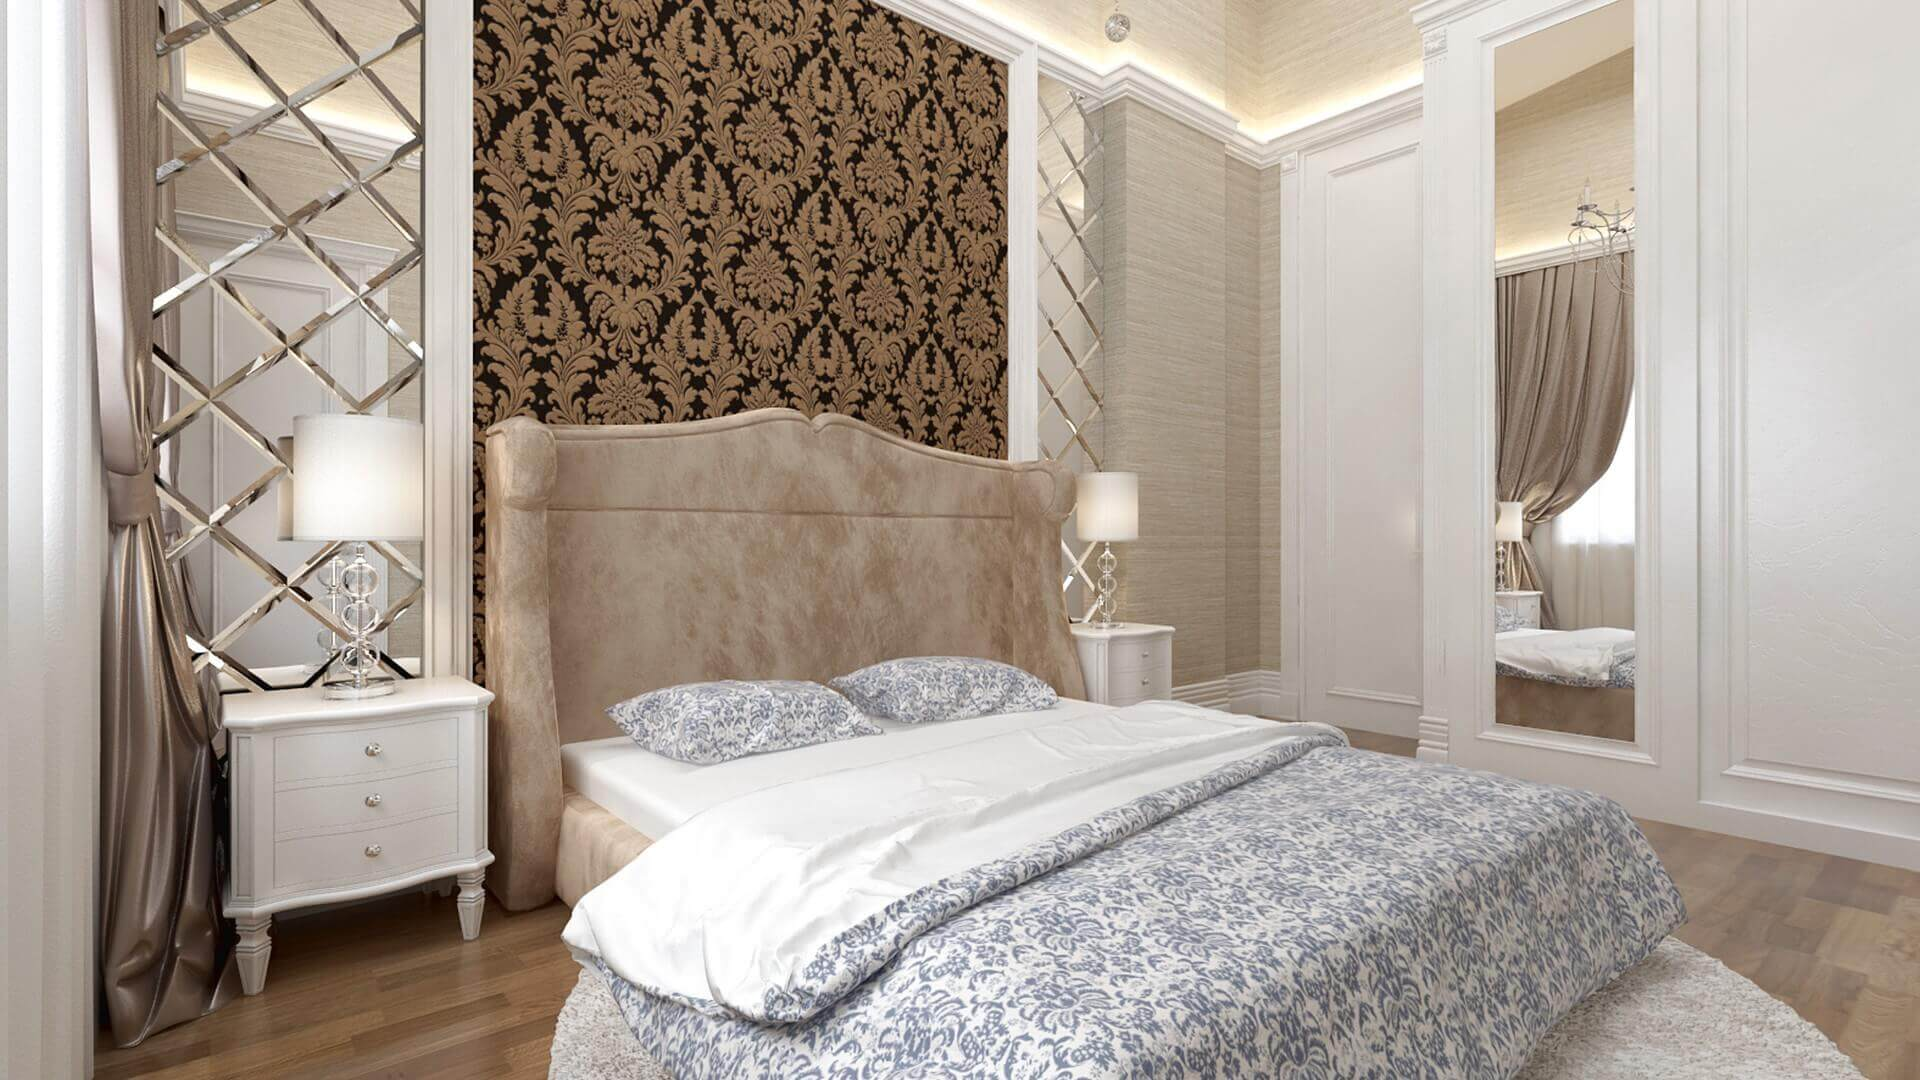 home inspiration 3297 S. Aslan Flat Residential